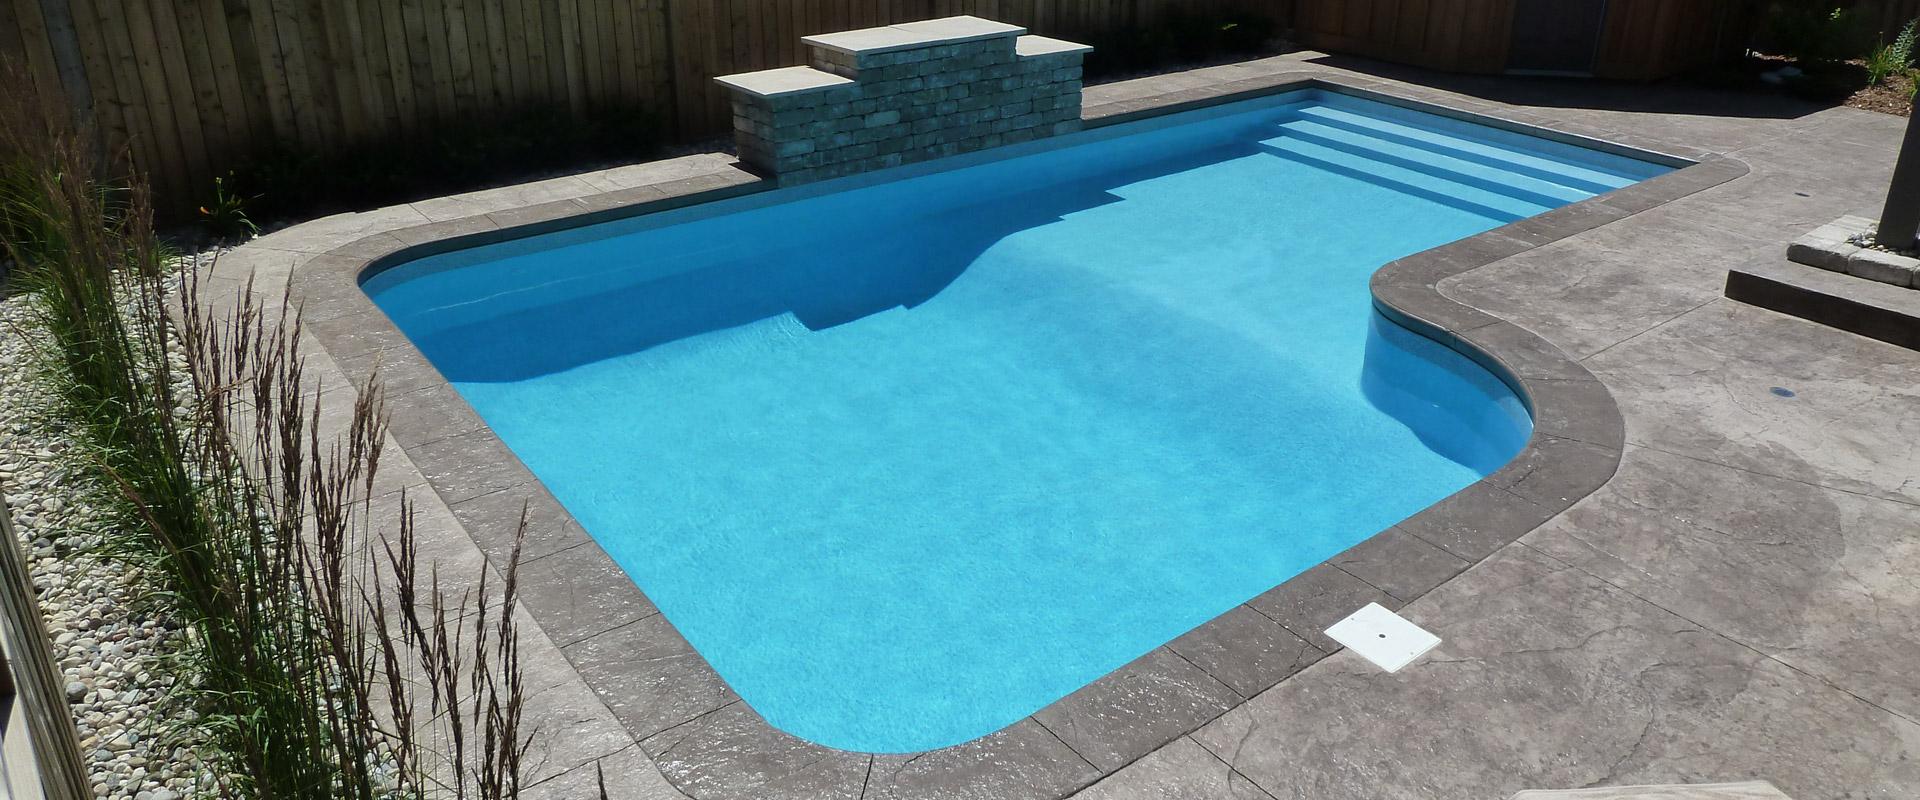 The Craigs Inground Pool Showcase Pioneer Family Pools